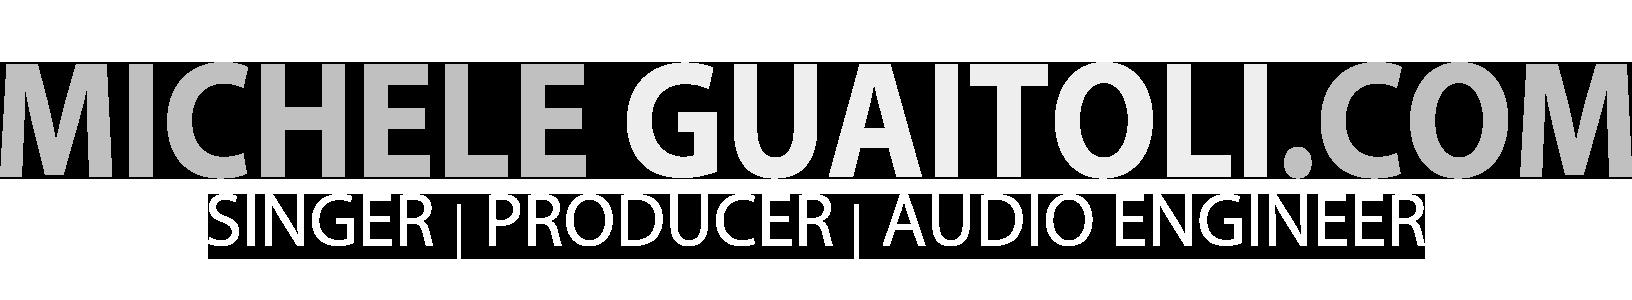 MicheleGuaitoli.com